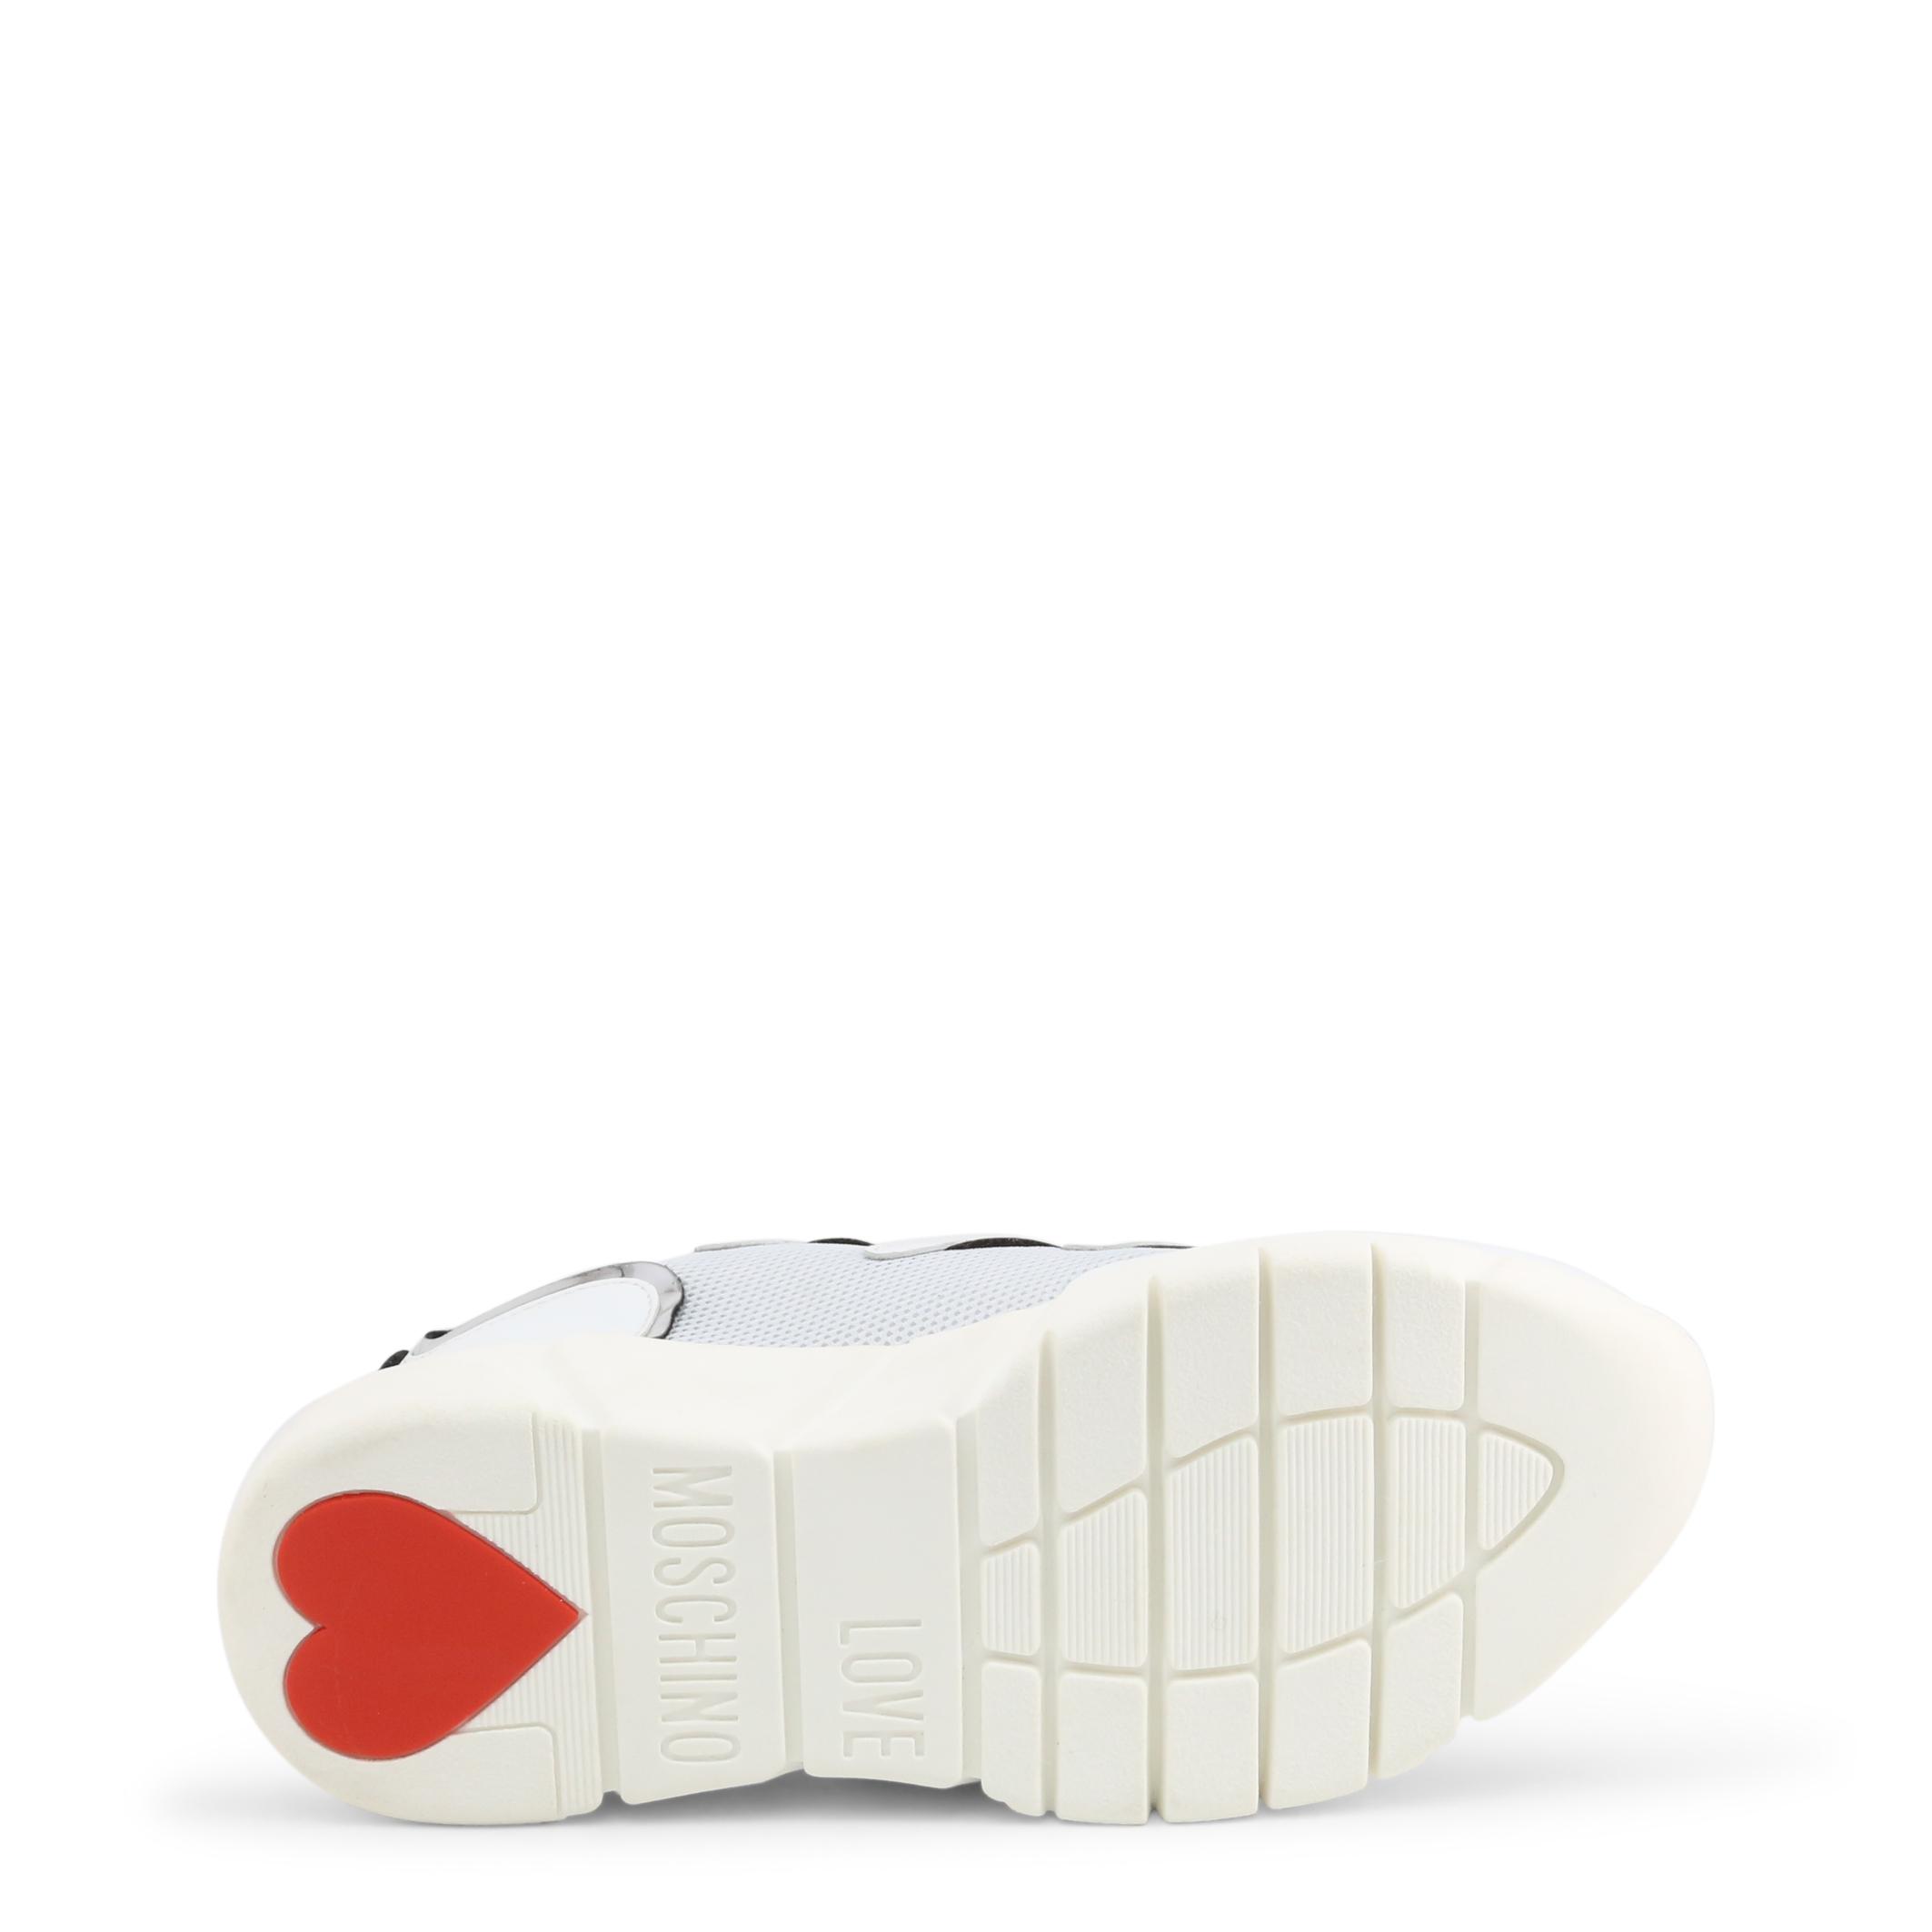 Baskets / Sneakers  Love moschino JA15153G1BIM_301A white